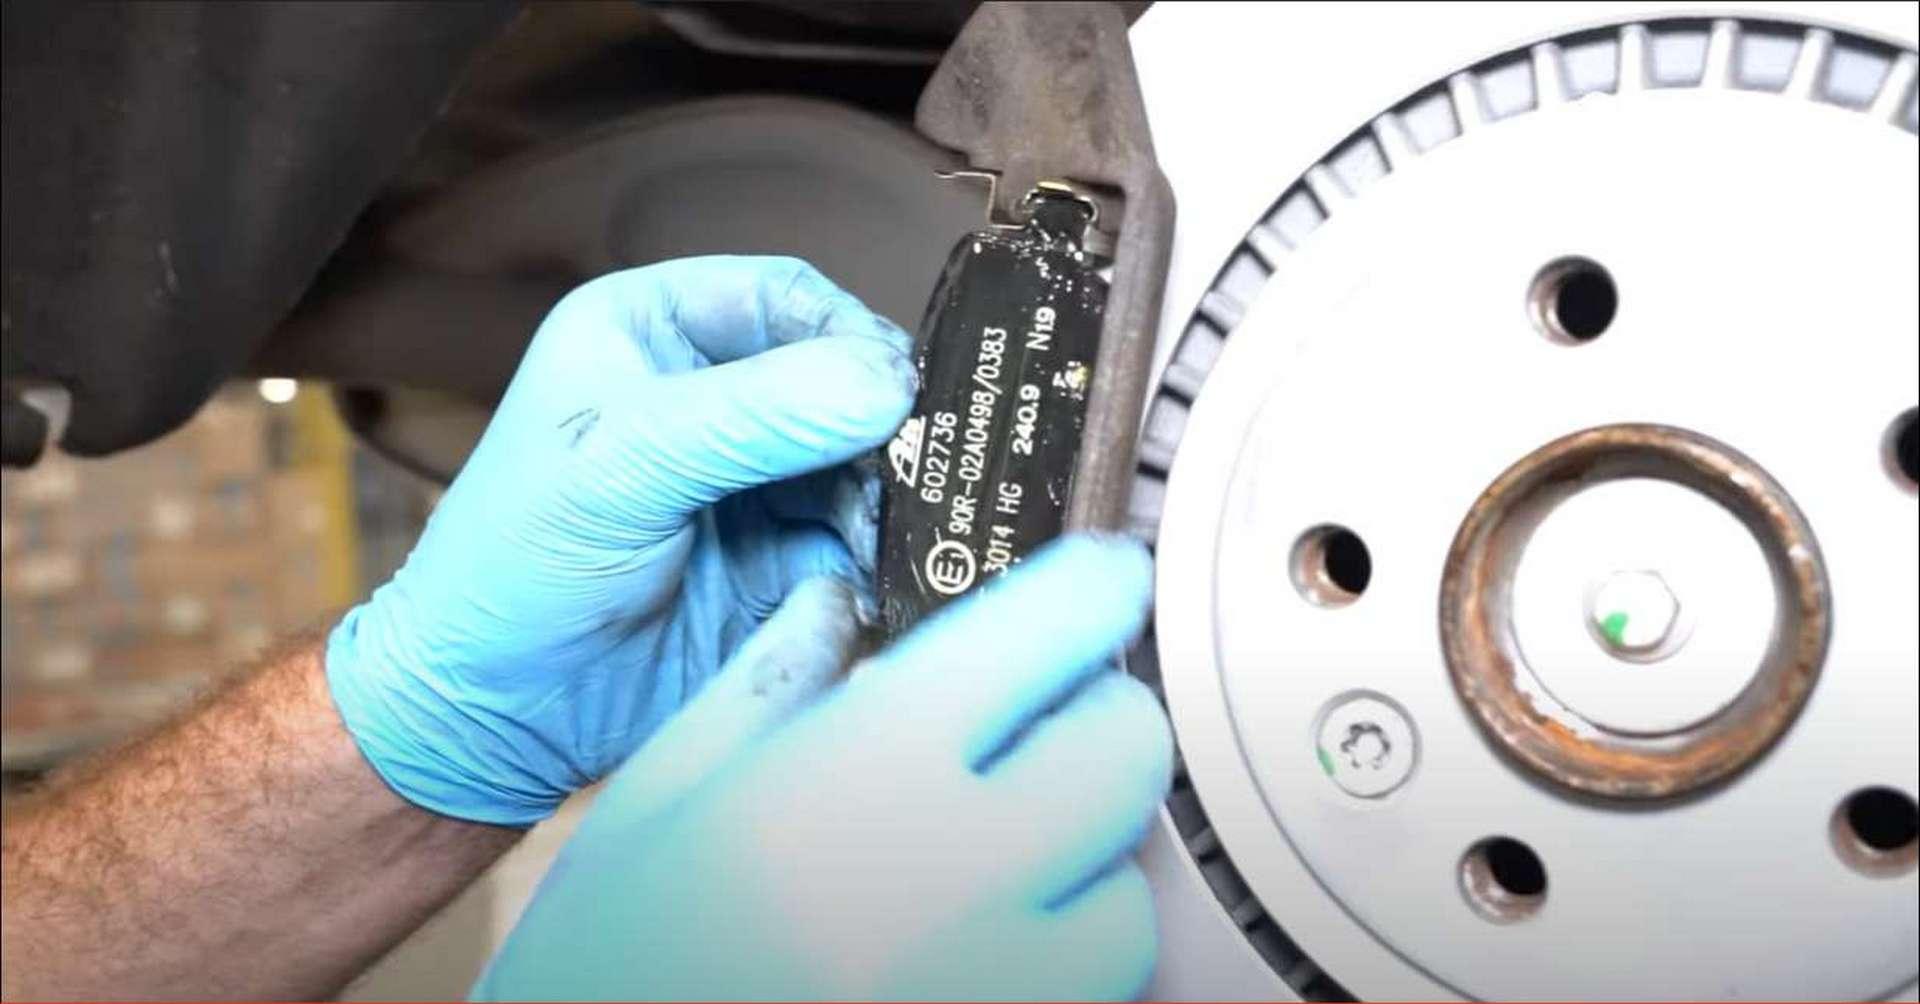 DIY P3 Volvo Rear Brakes installing the pads